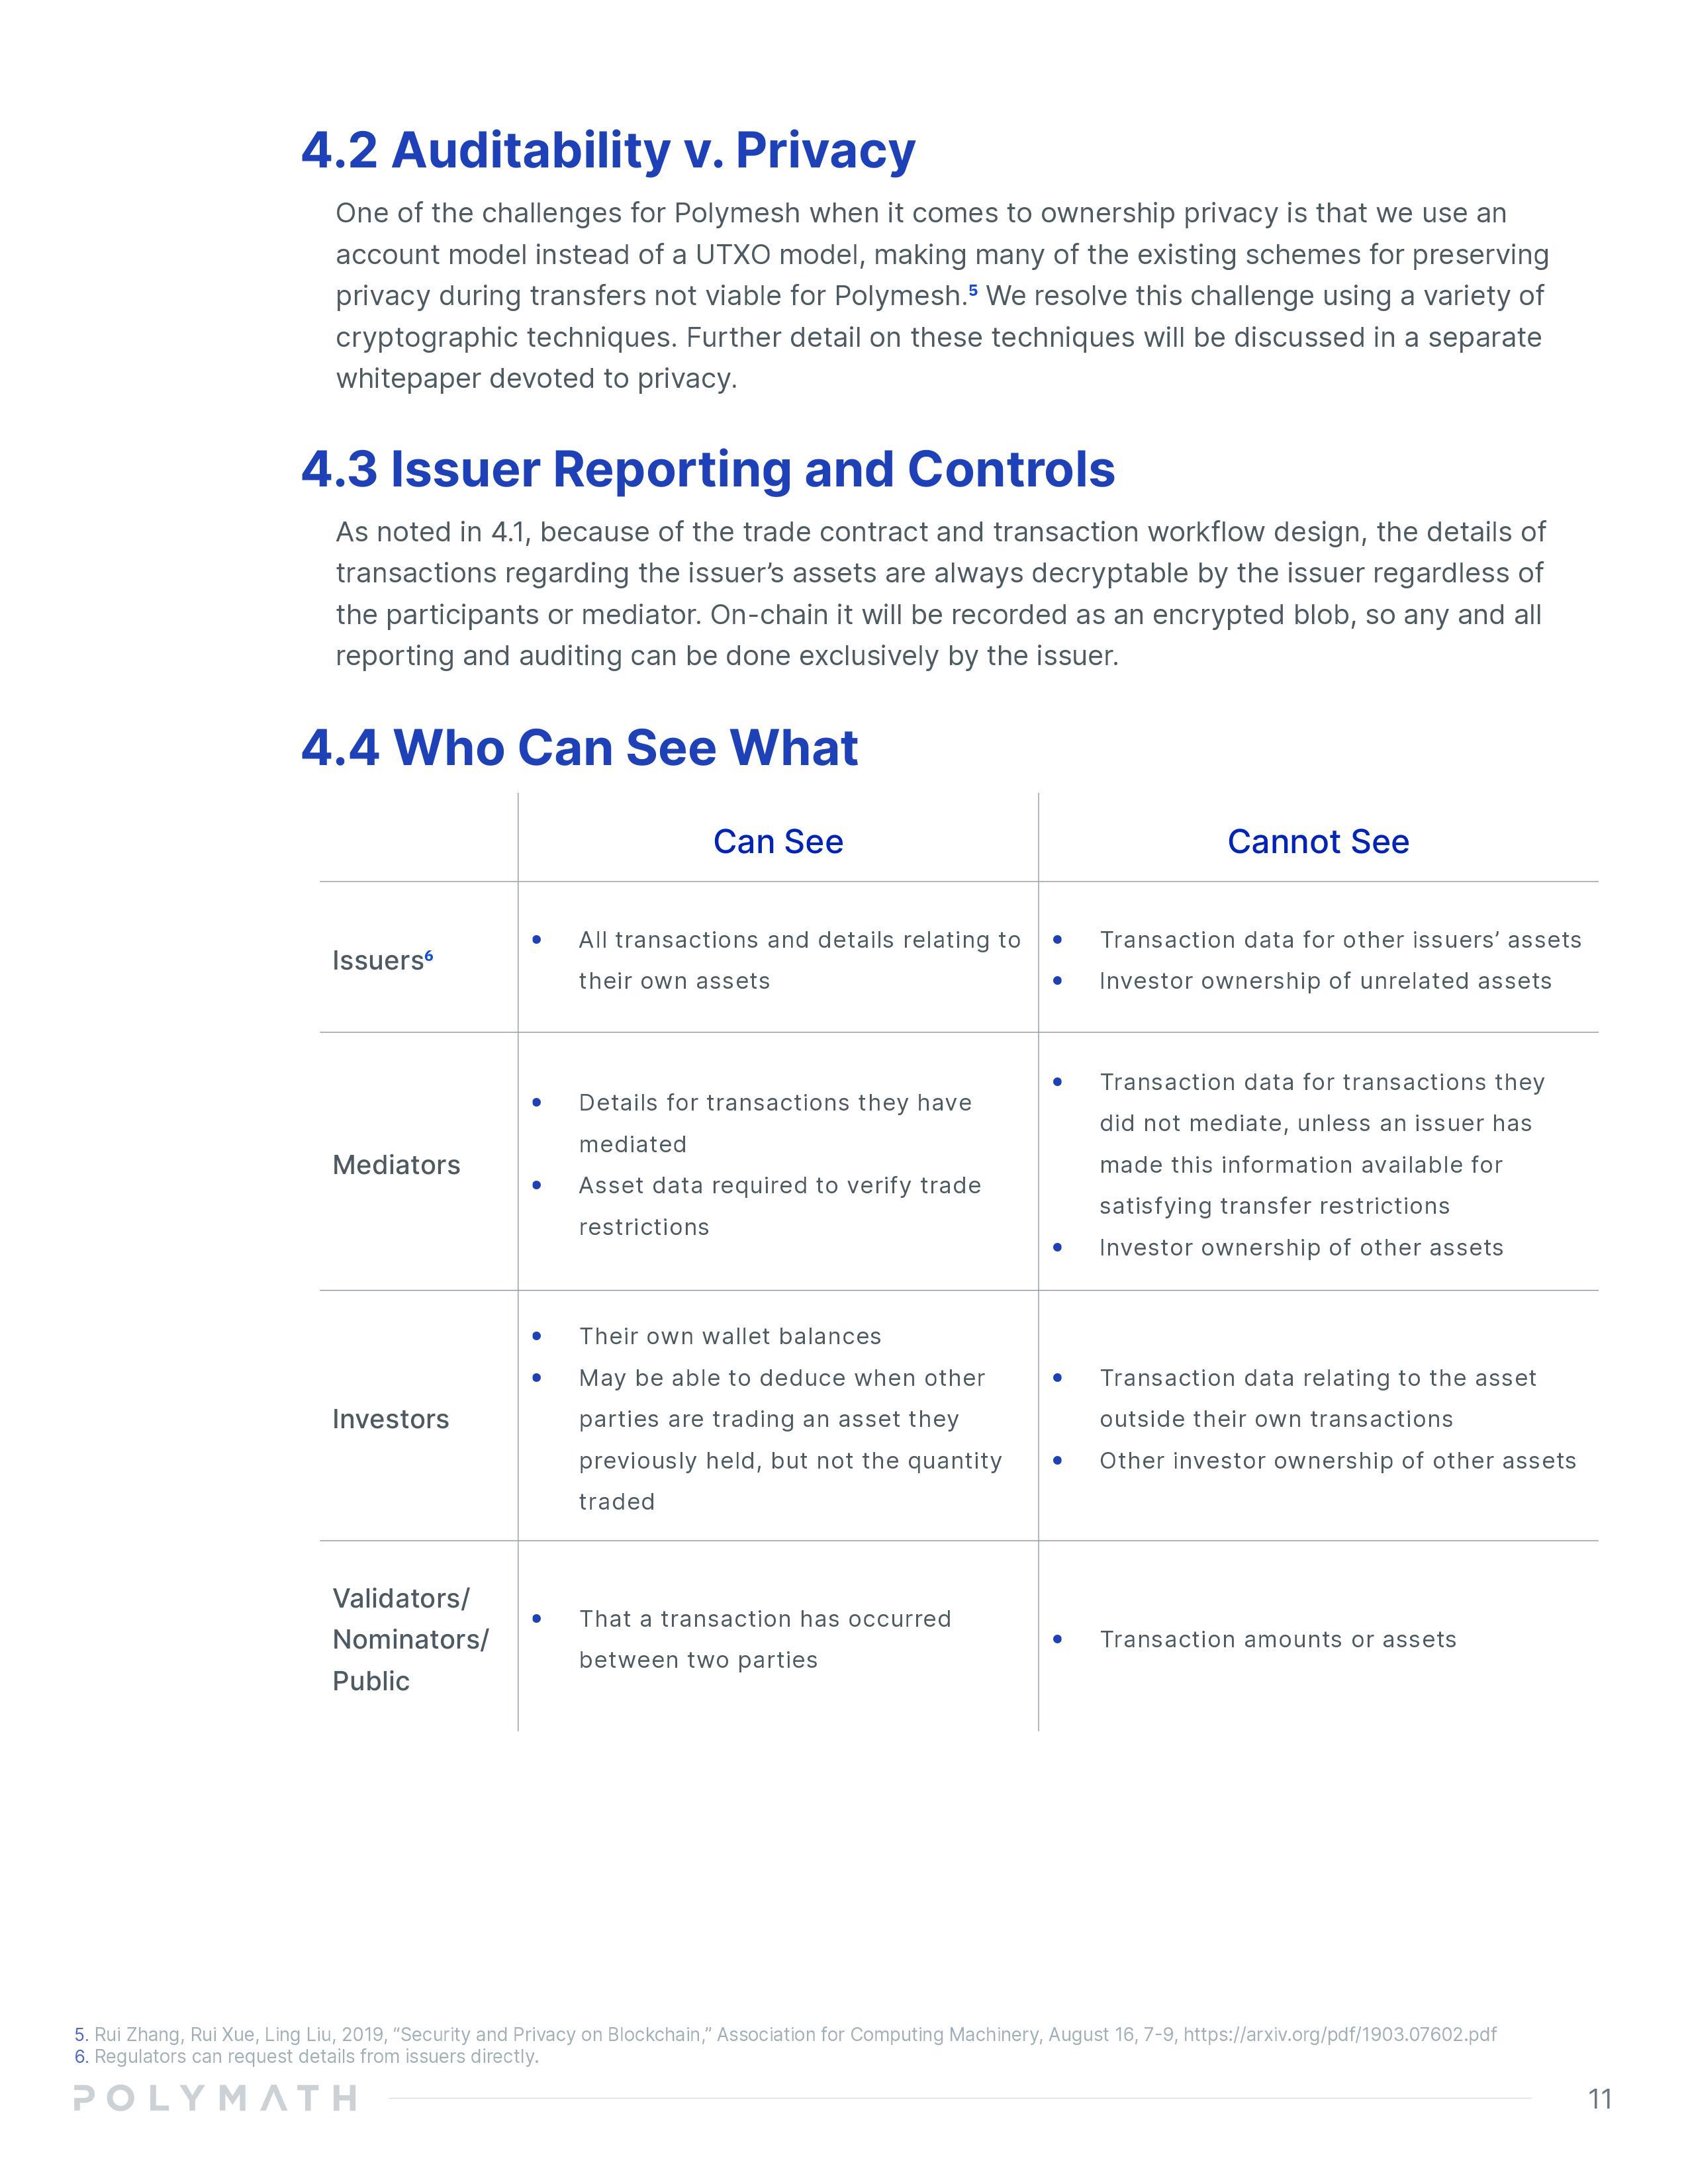 Polymath Whitepaper Page 15